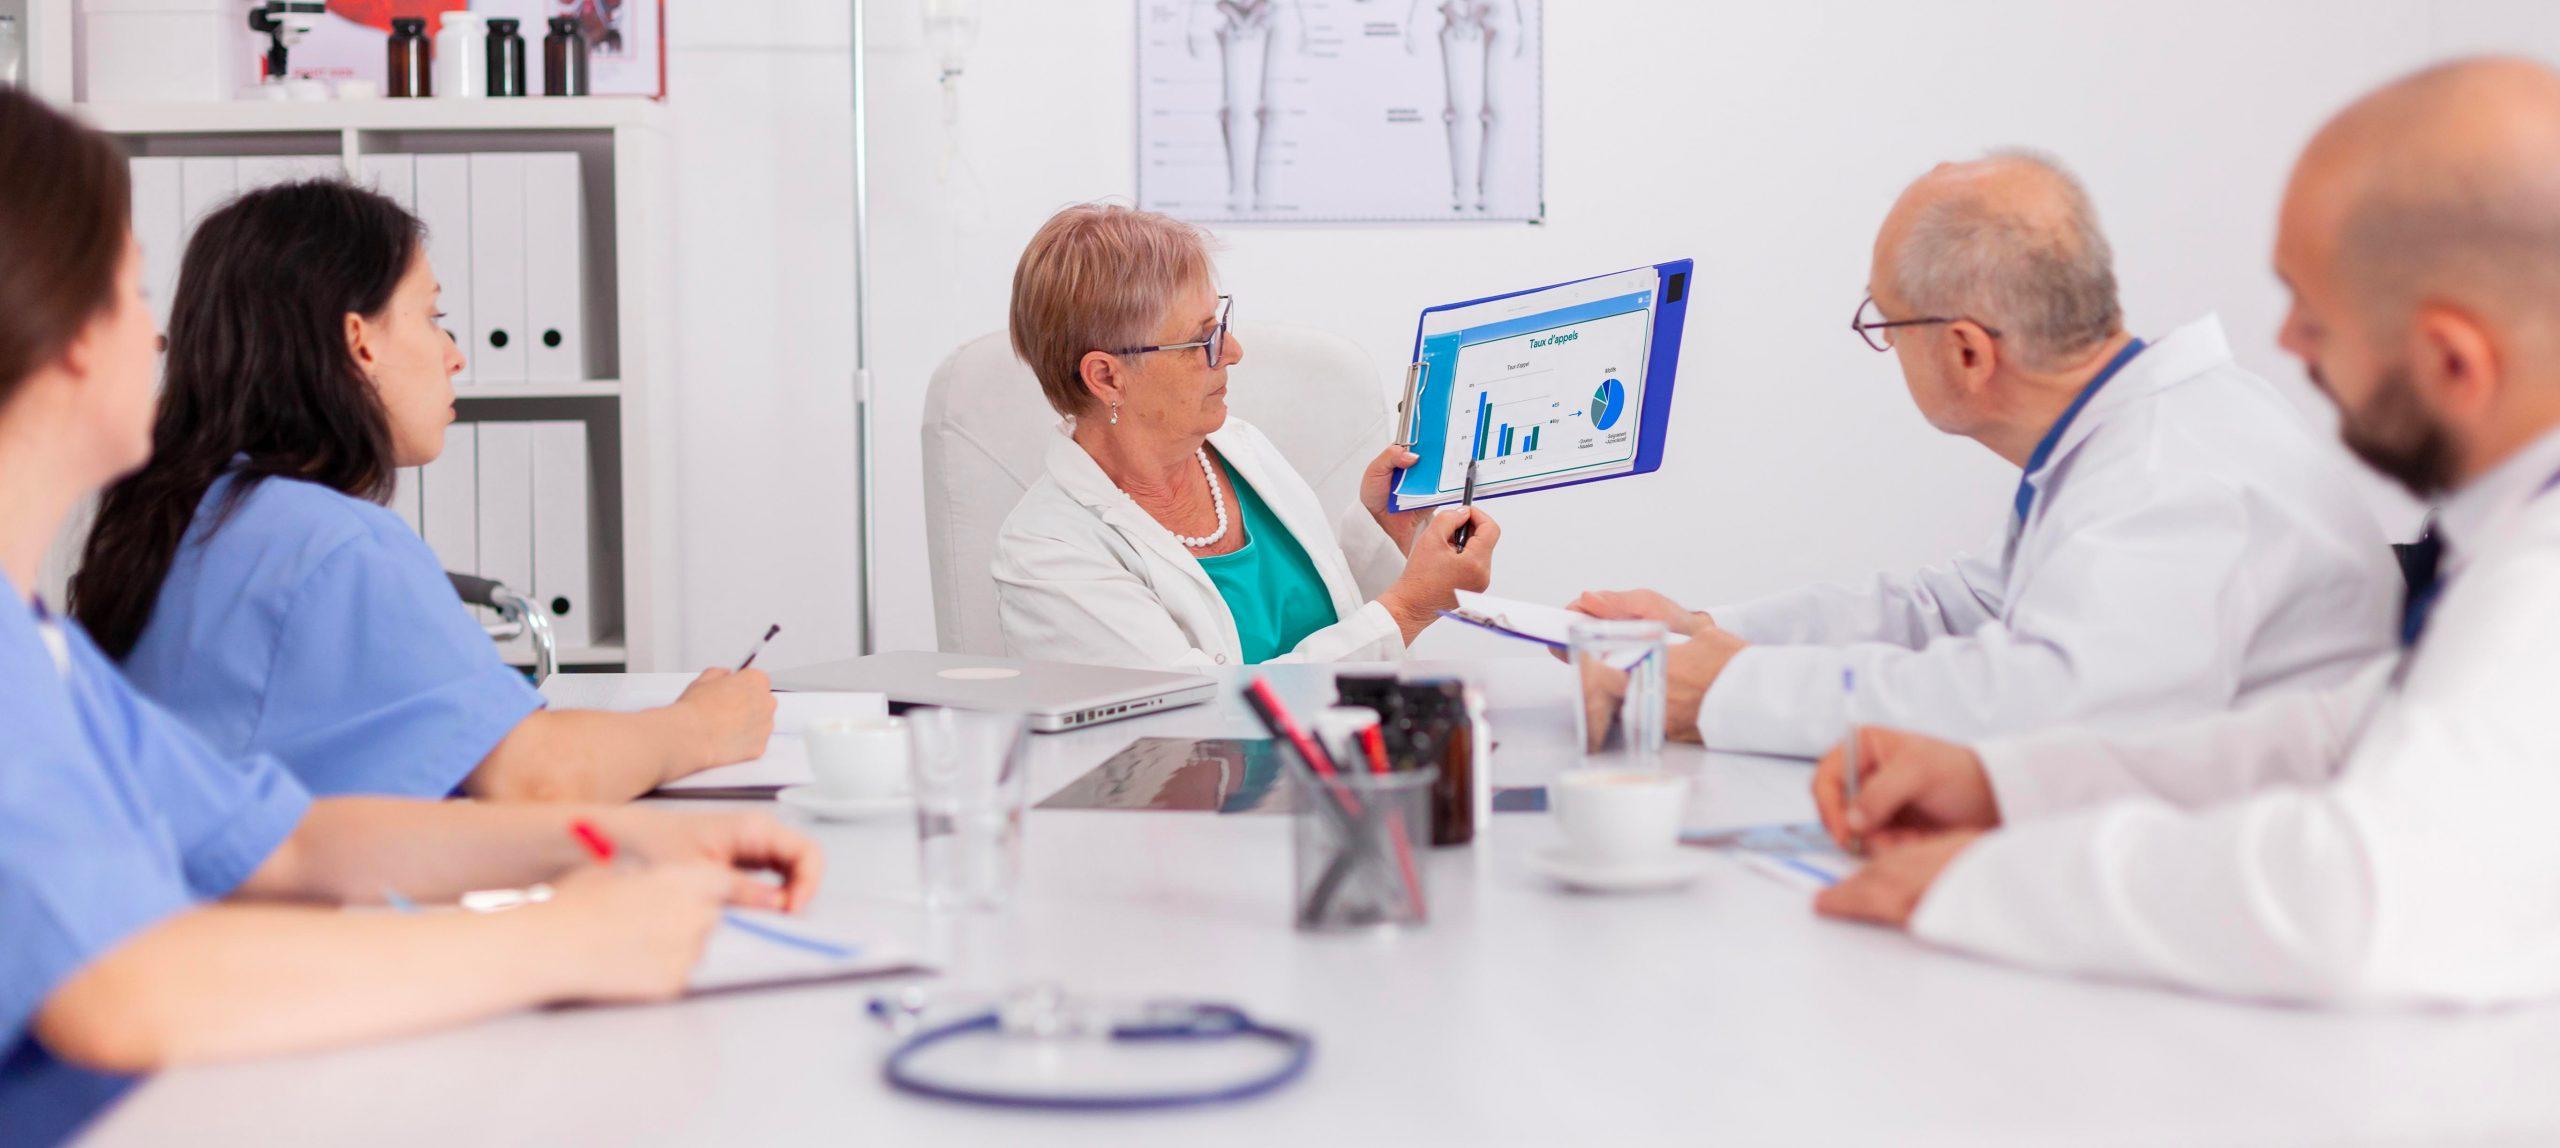 senior-pedia3trician2-woman-d5i1scussing-sickness-treatment-using-clipboard-for-medical-presentation